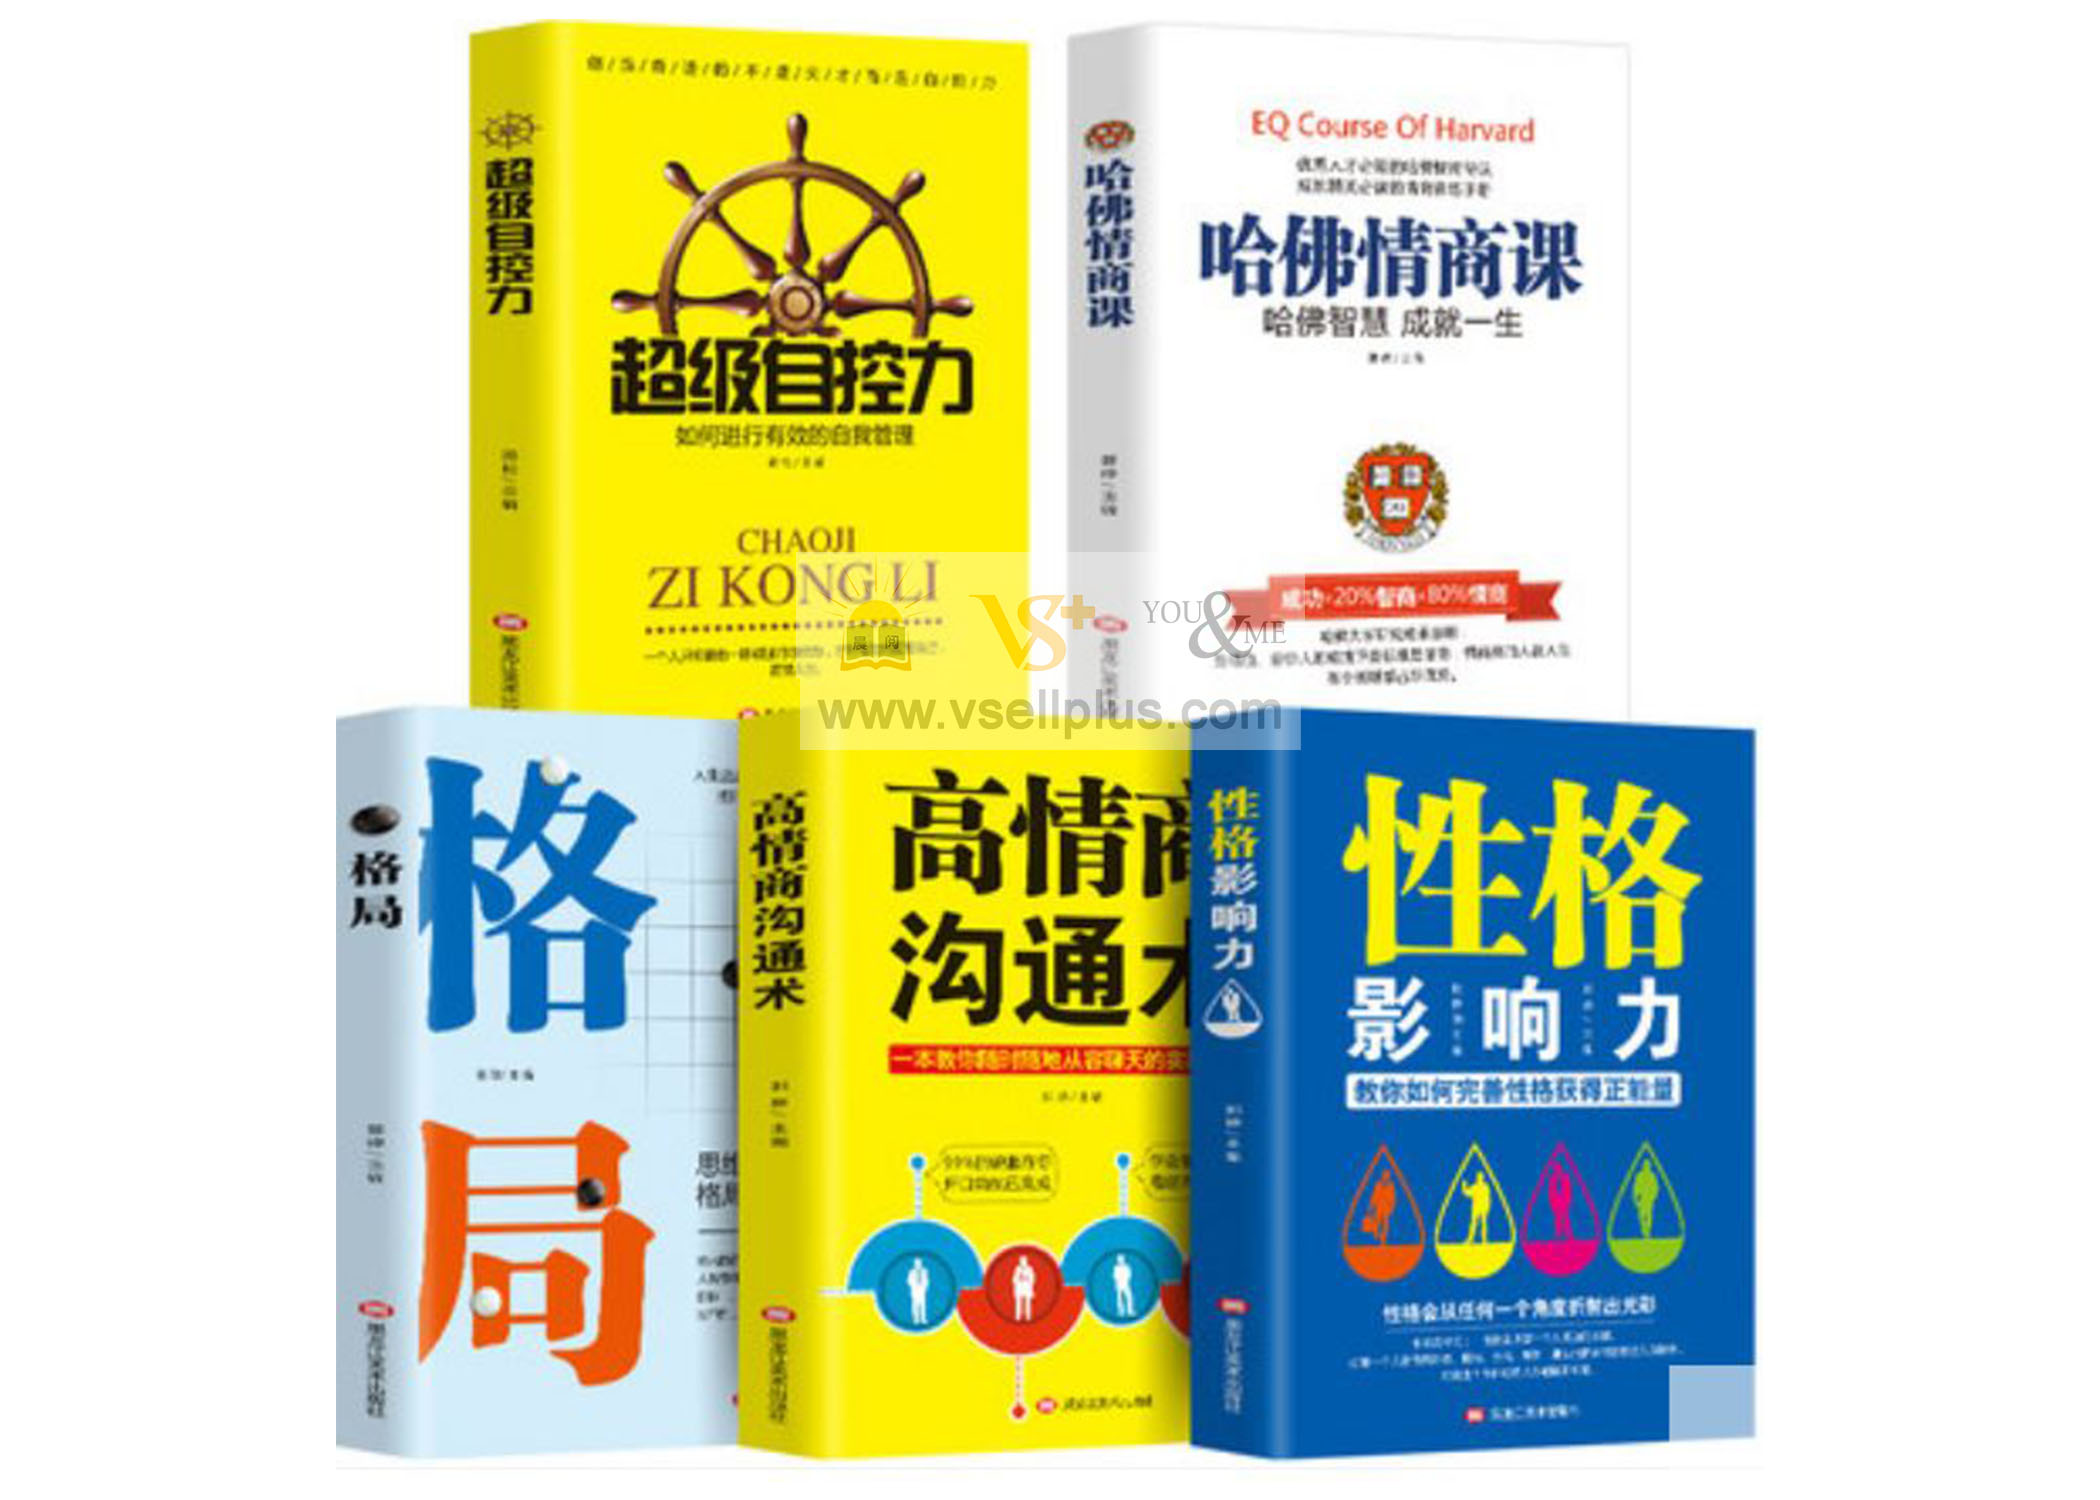 Ready Stock- Self help books 全5册超级自控力+ 格局+ 哈佛情商课 + 性格影响力+ 高情商沟通术